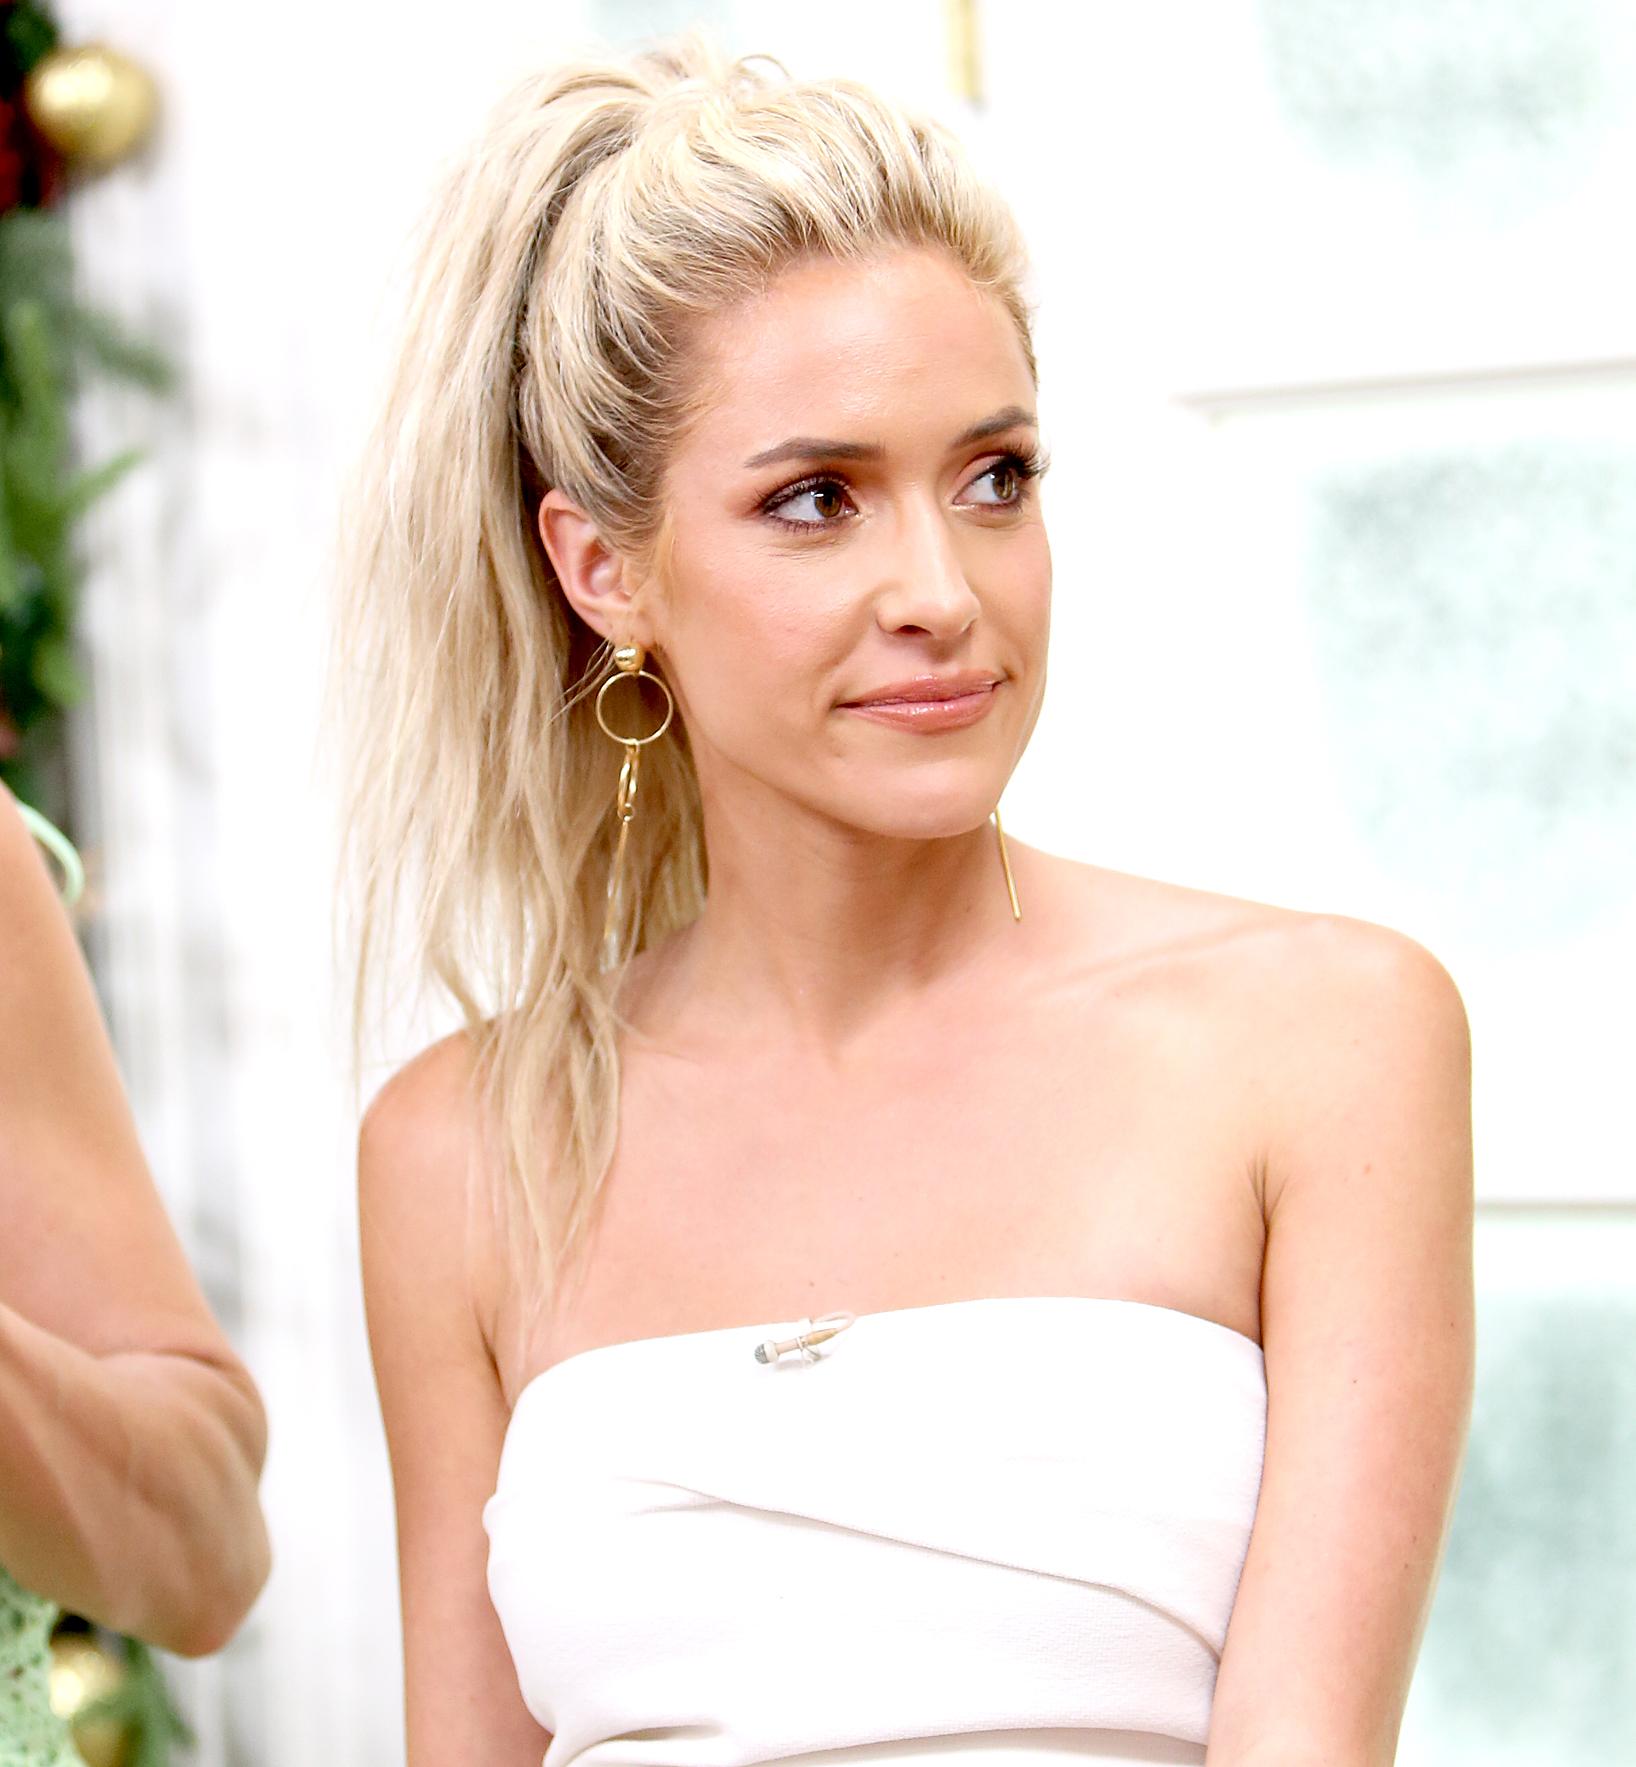 Kristin--Cavallari-Slams-Plastic-Surgery-Rumors - Kristin Cavallari visits Hallmark's 'Home & Family' celebrating 'Christmas In July' at Universal Studios Hollywood on July 20, 2018 in Universal City, California.